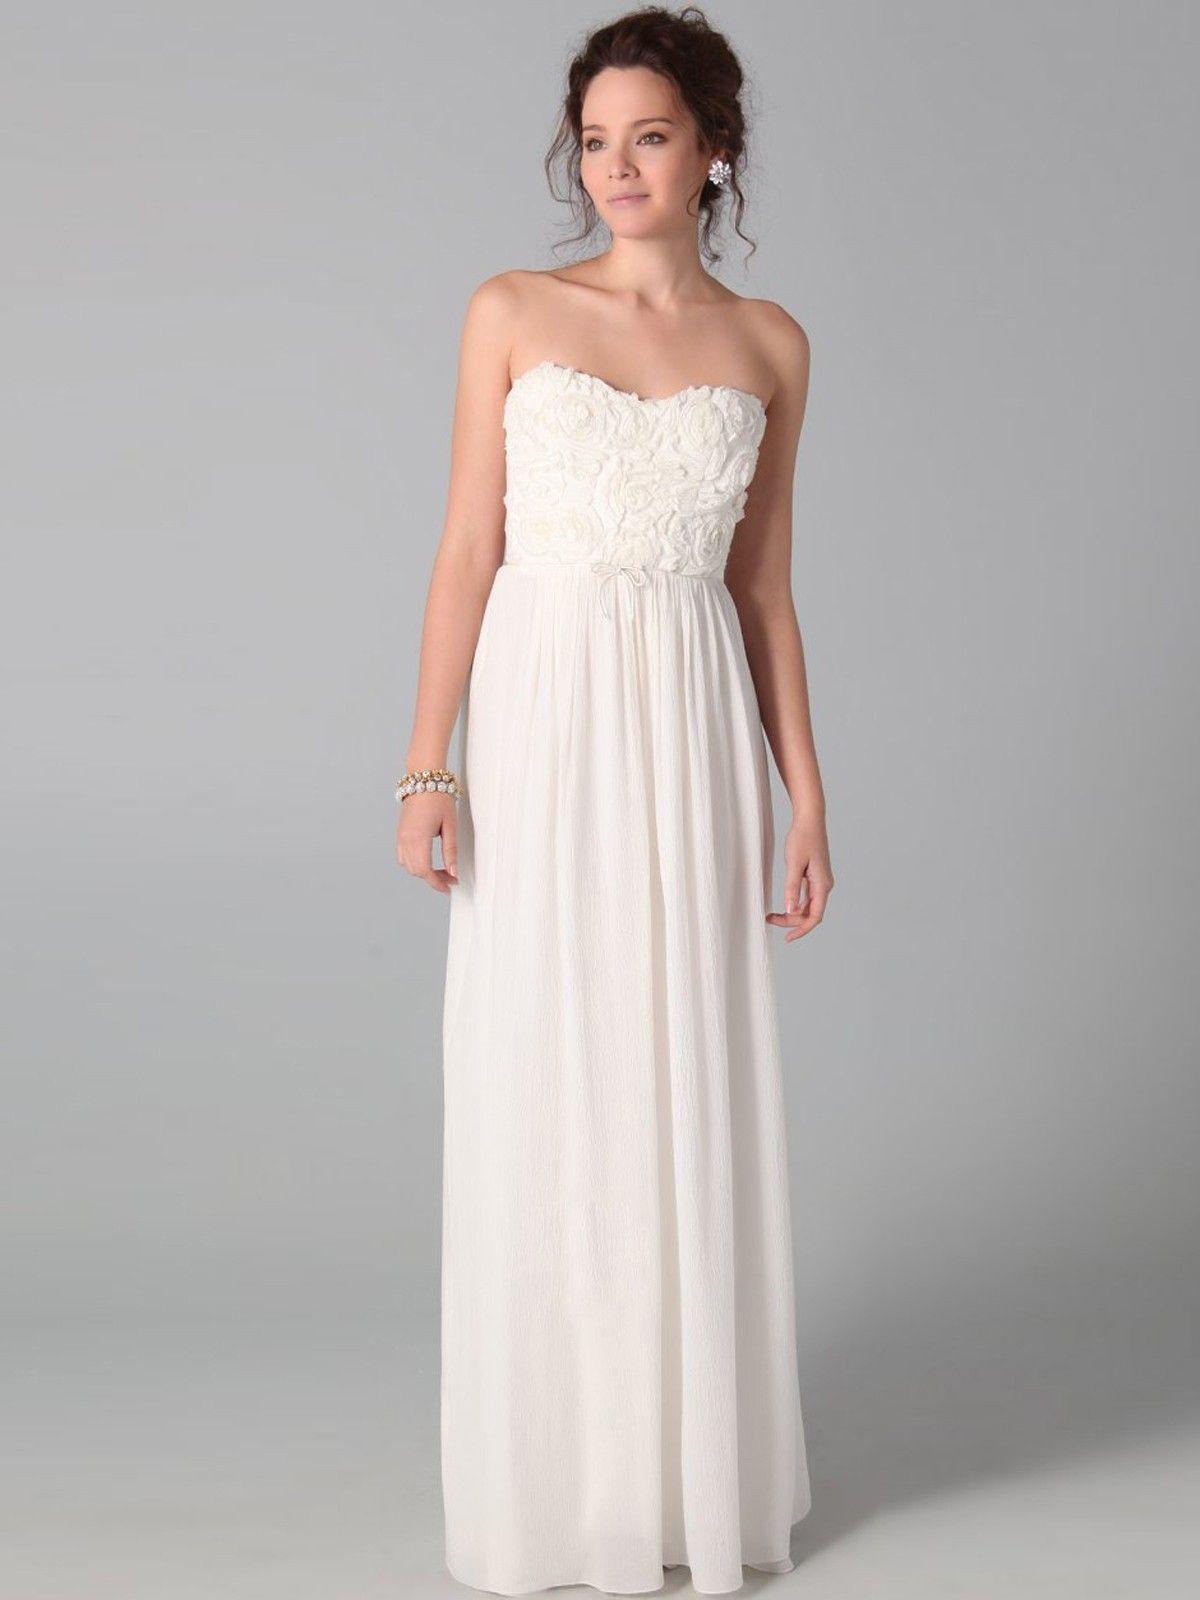 346704d4dbfb Elegant A-line Strapless Ruffles Sleeveless Floor-length Chiffon Dress